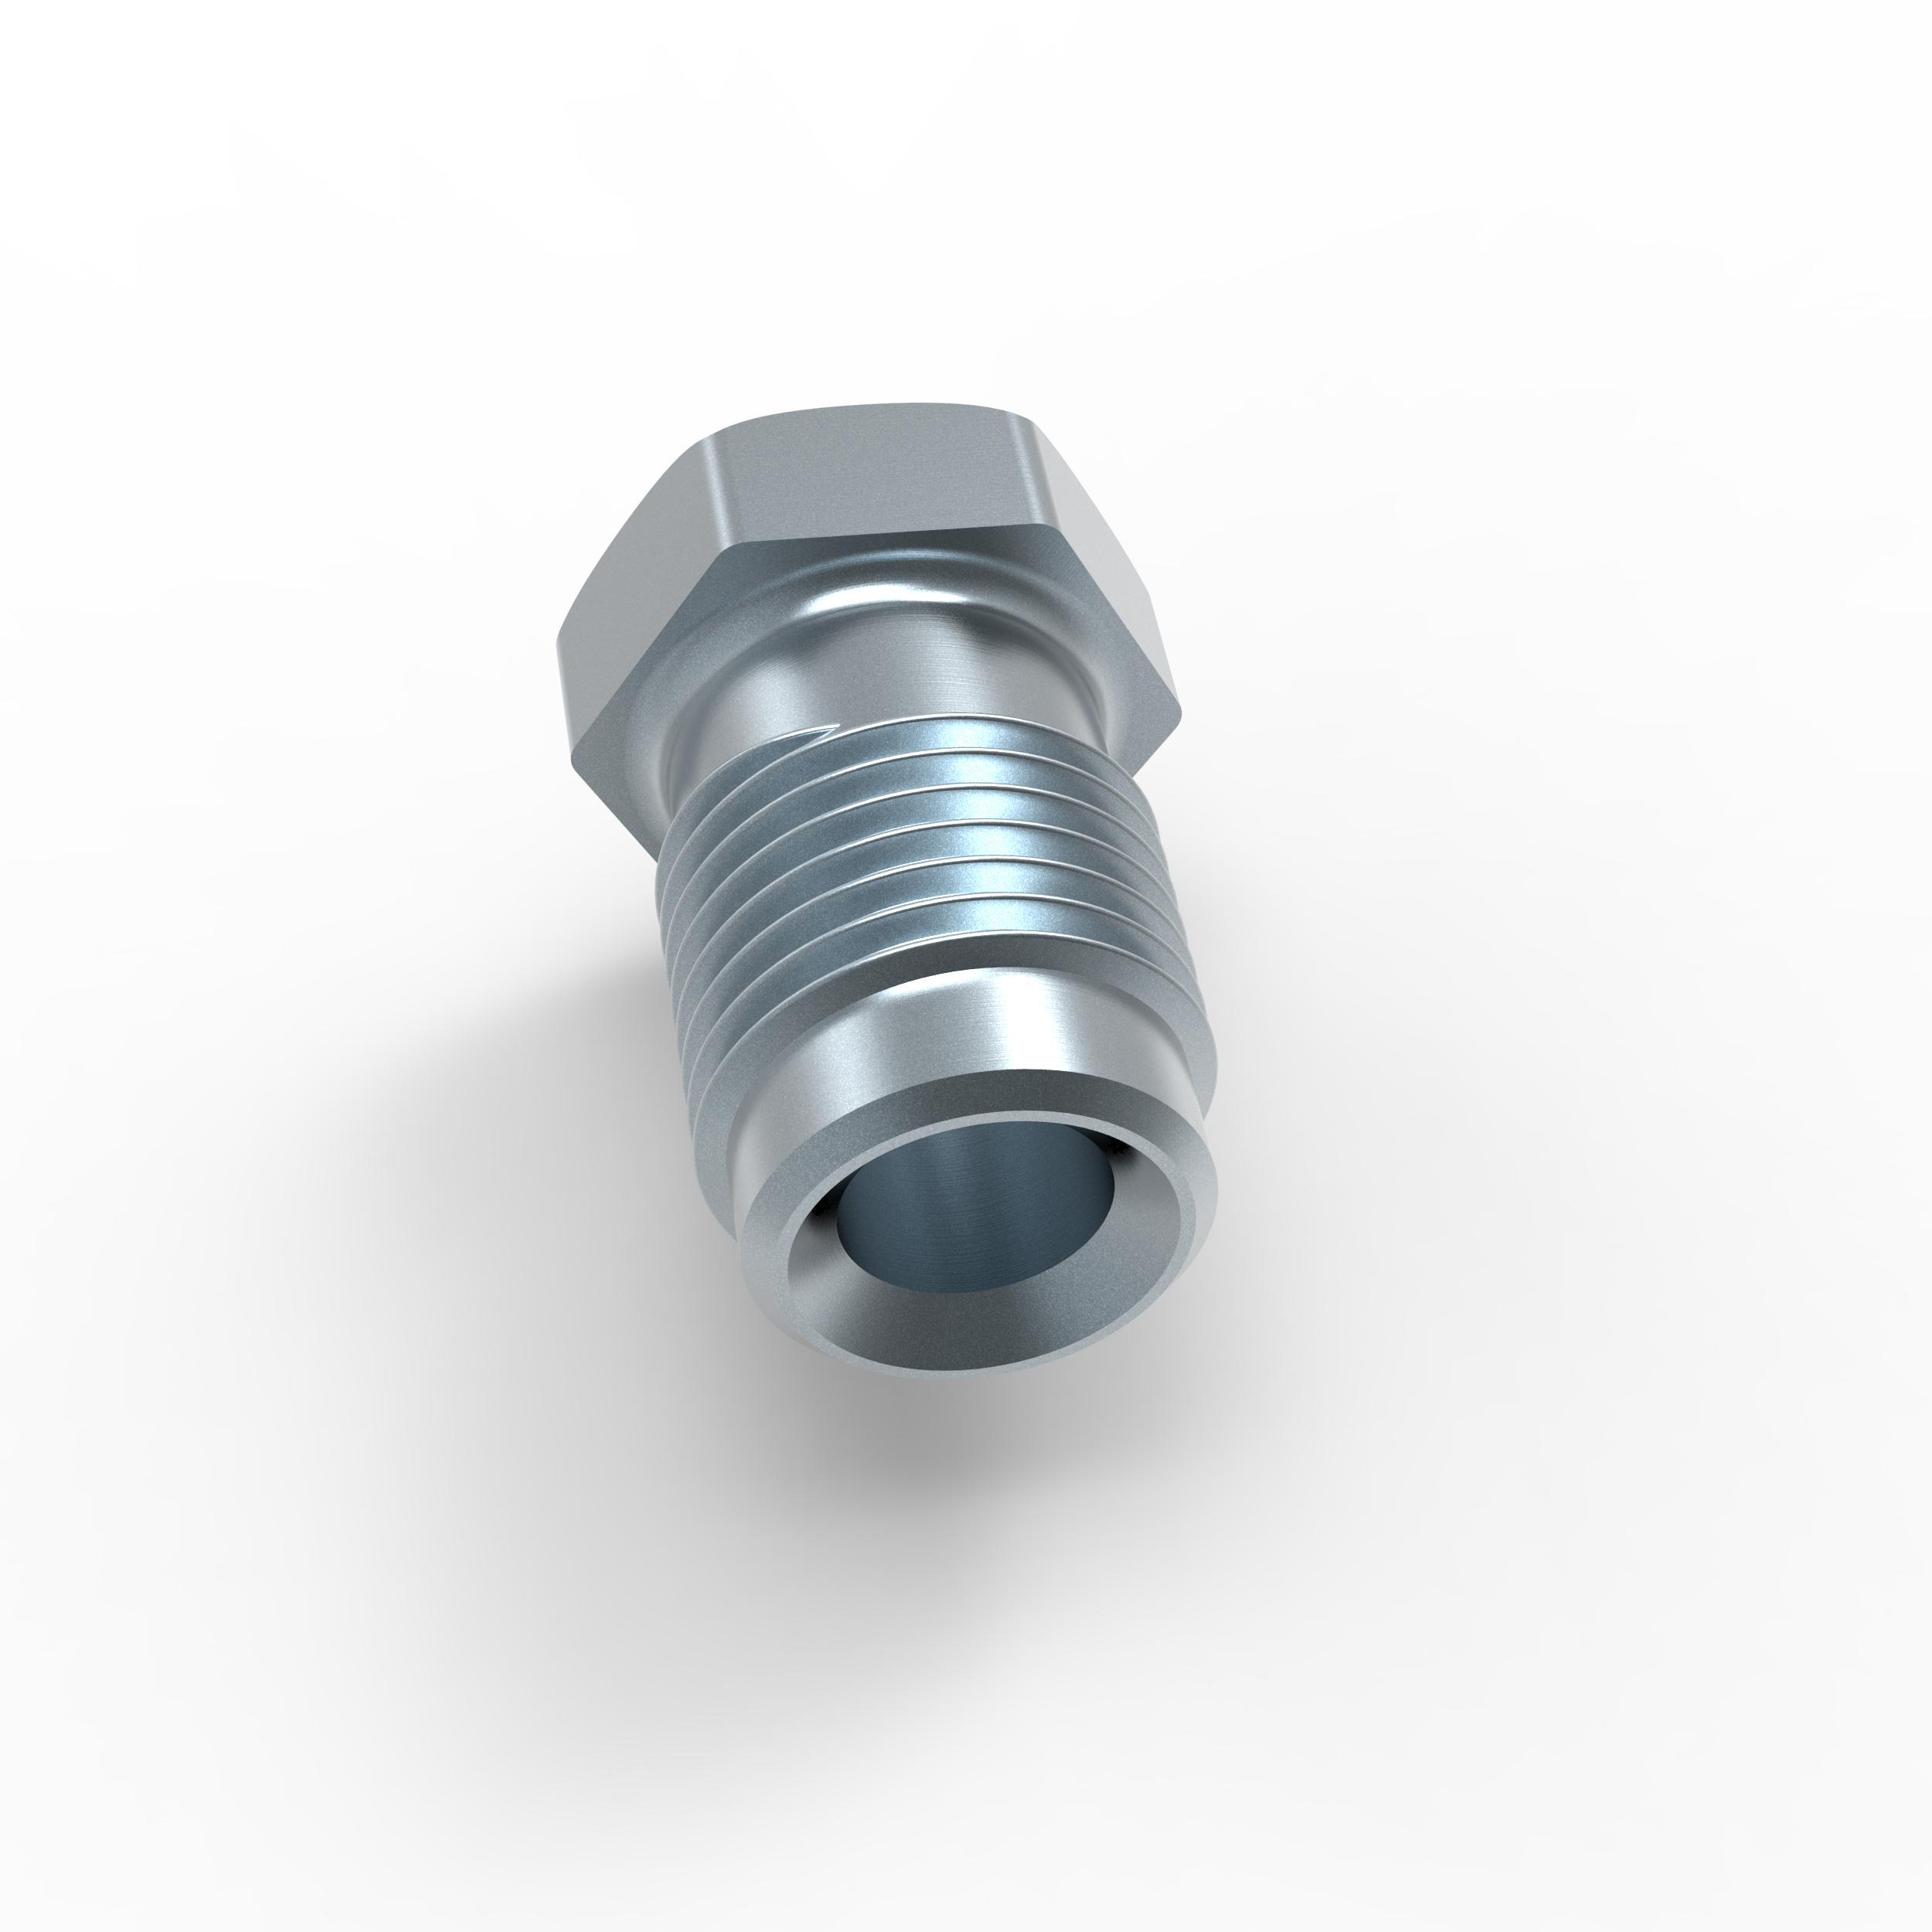 6x Verschraubung 3//8 x 24 f/ür Bremsleitung 4,75 mm B/ördel E Typ H Profi Verbinder DIN//ISO 1651 konform